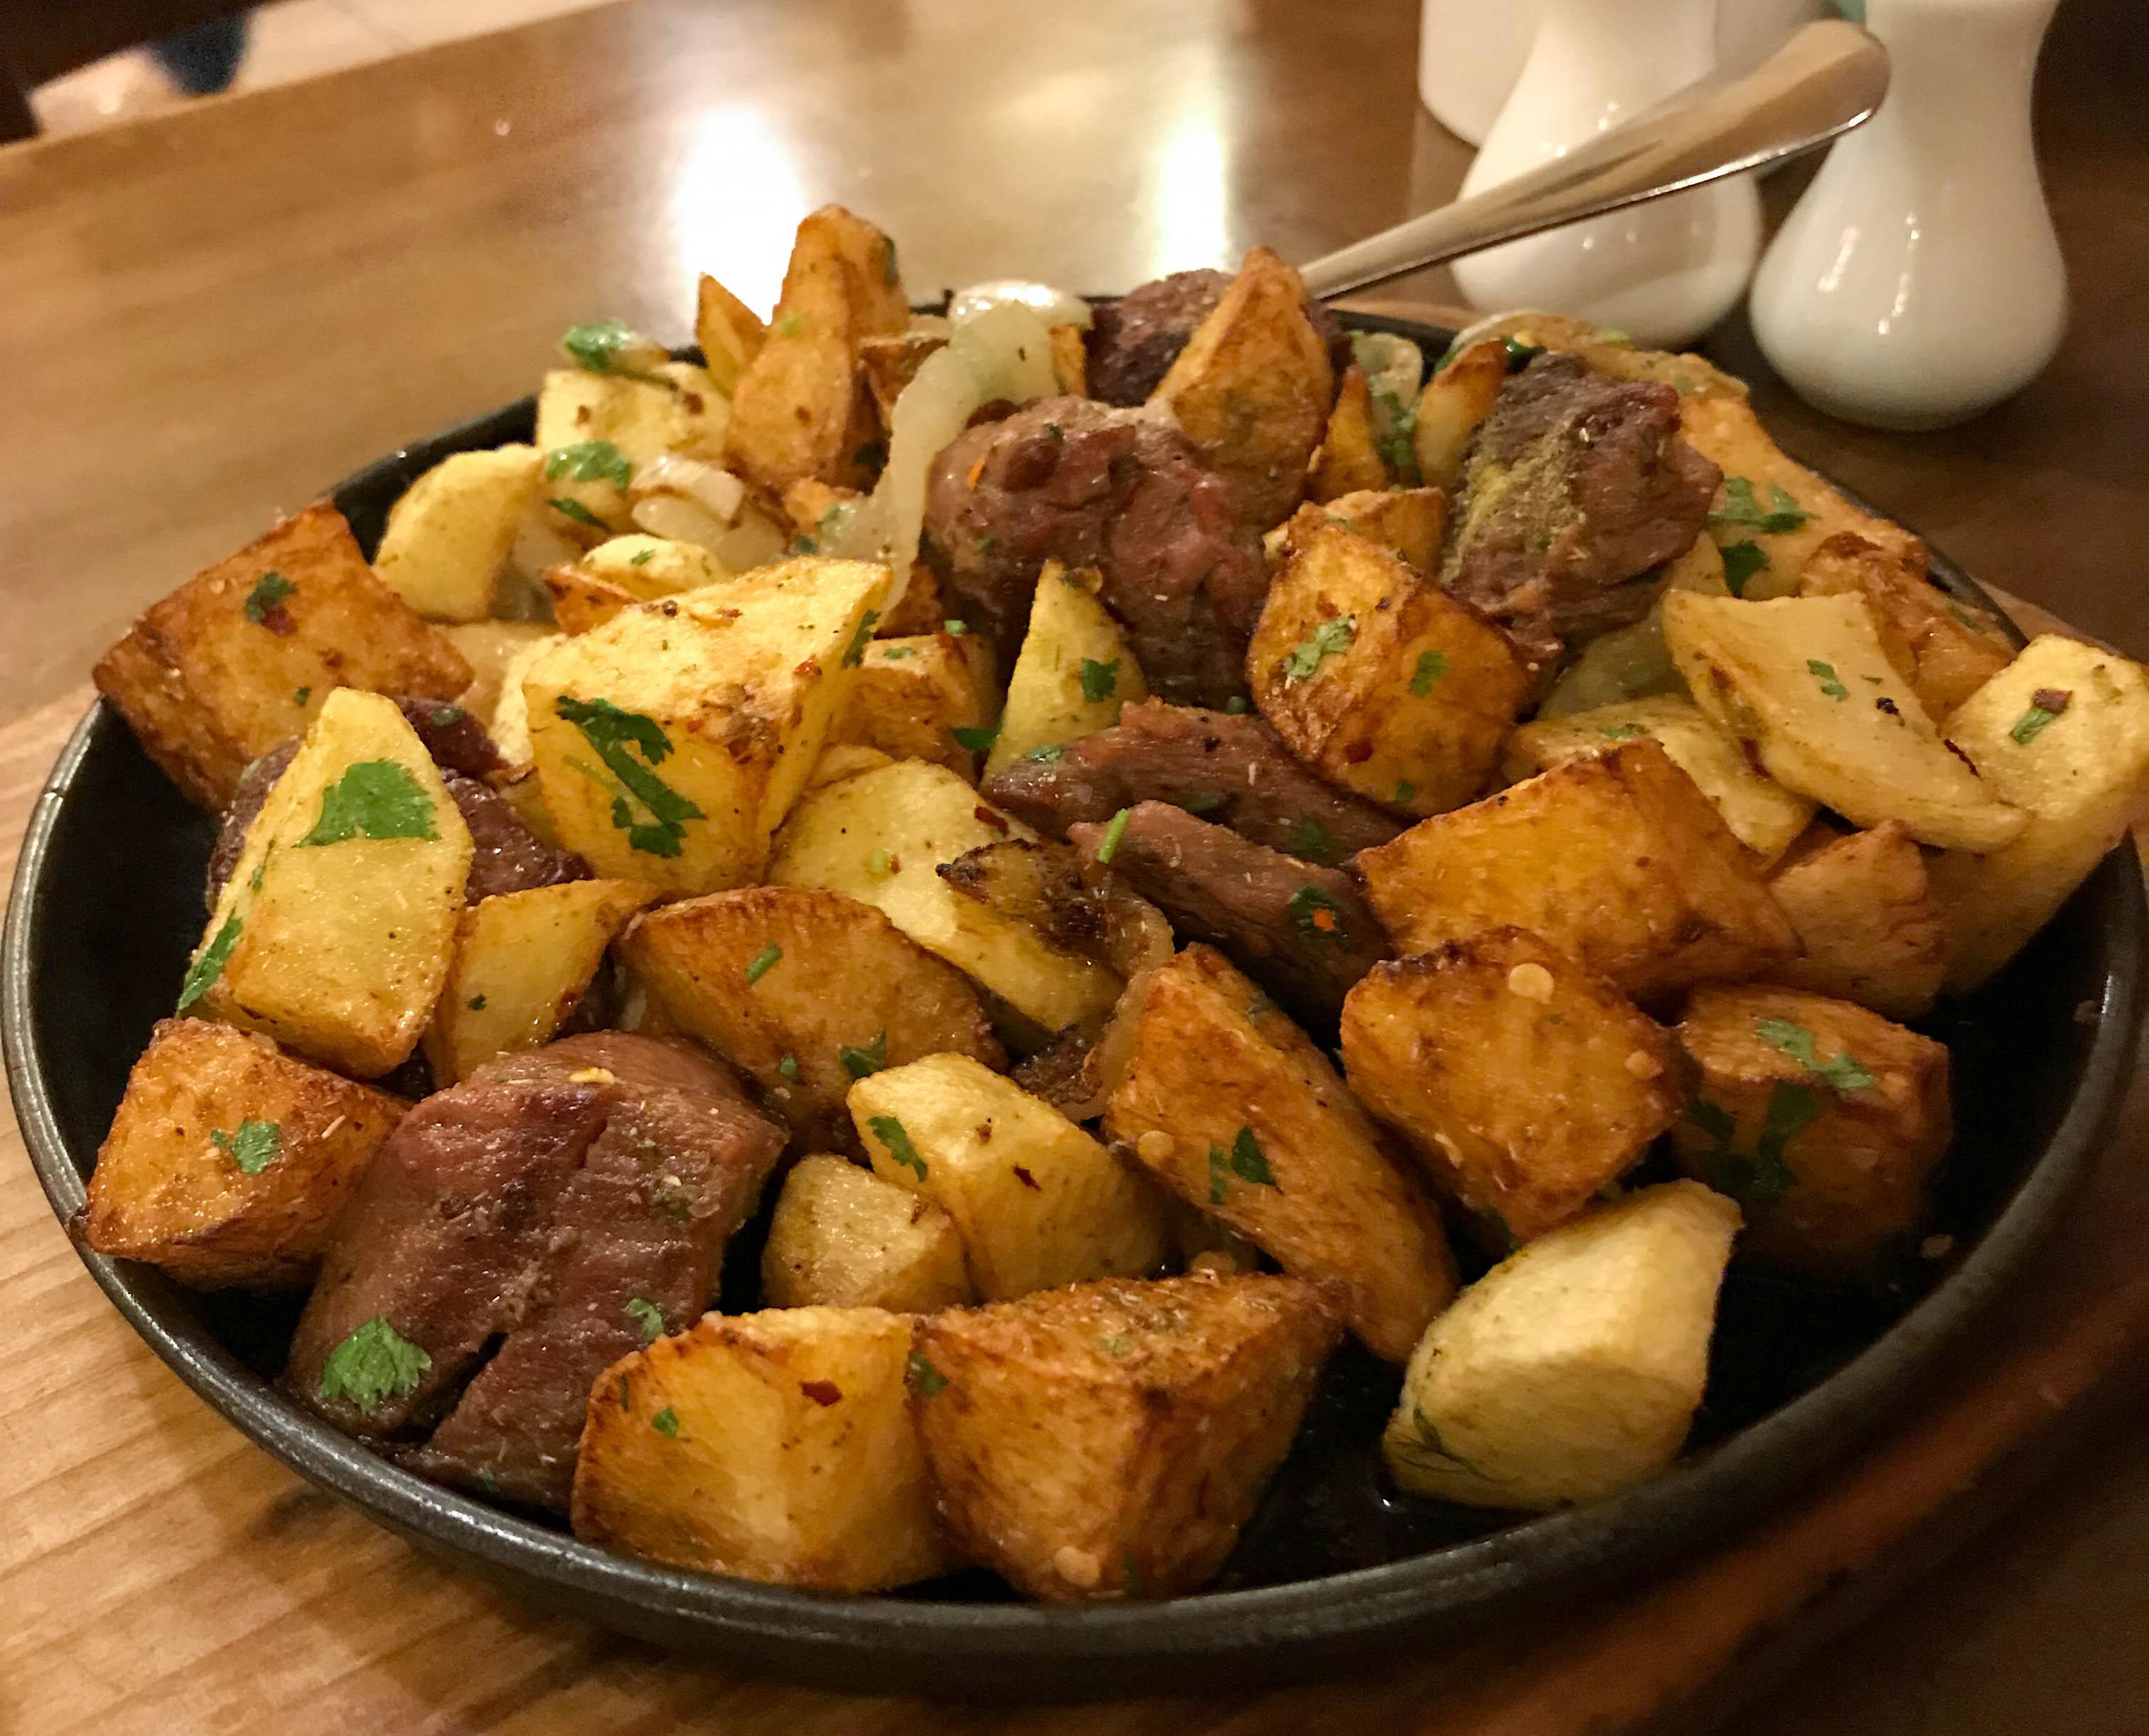 Odjakhuri meat and potato stew, sautéed with onions, georgian cuisine